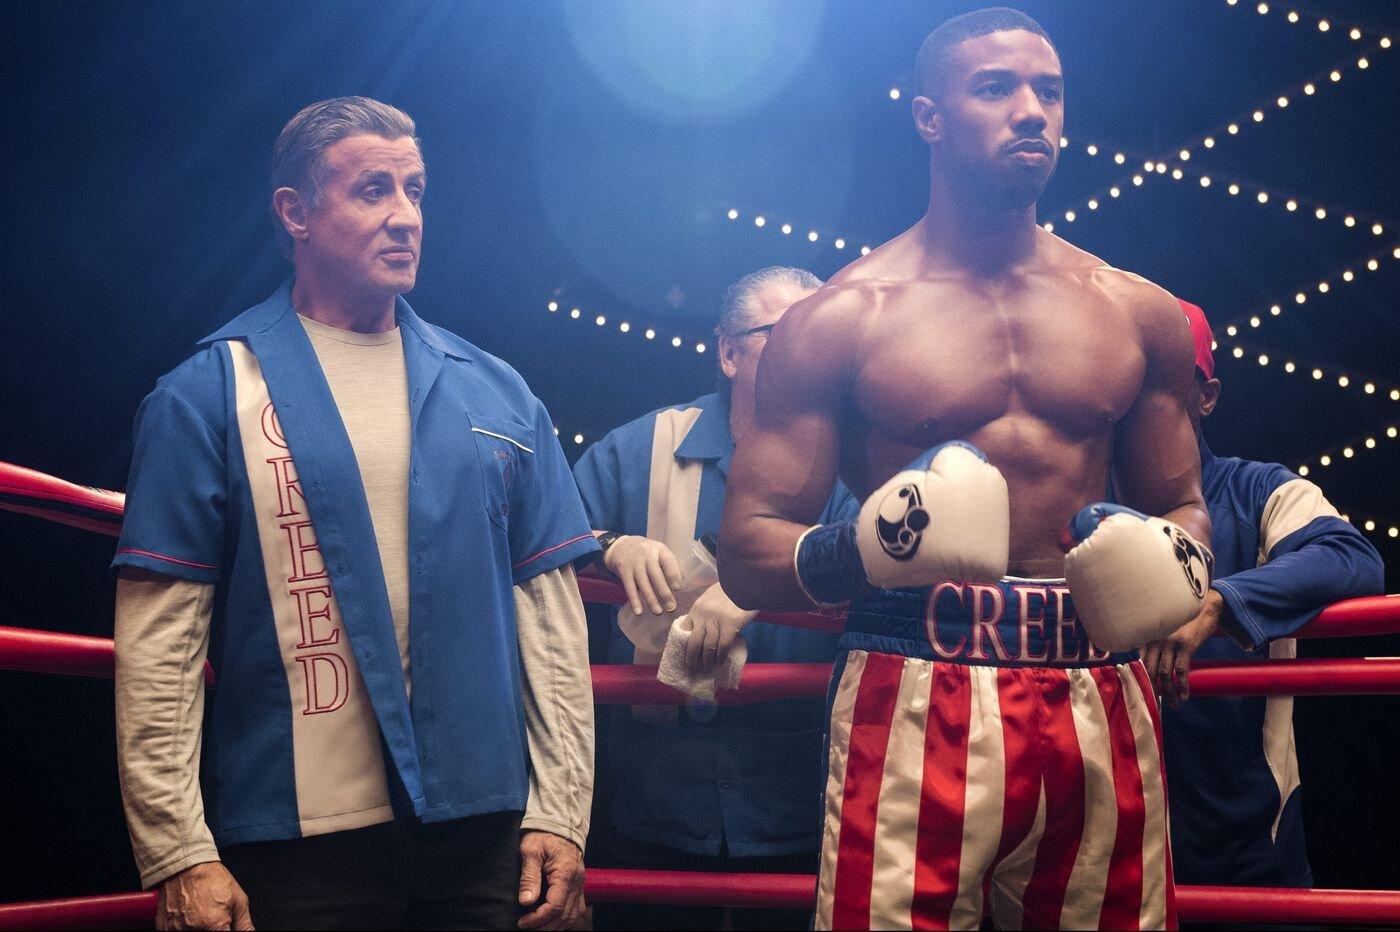 Jordan to direct third 'Creed' movie, says co-star Tessa Thompson